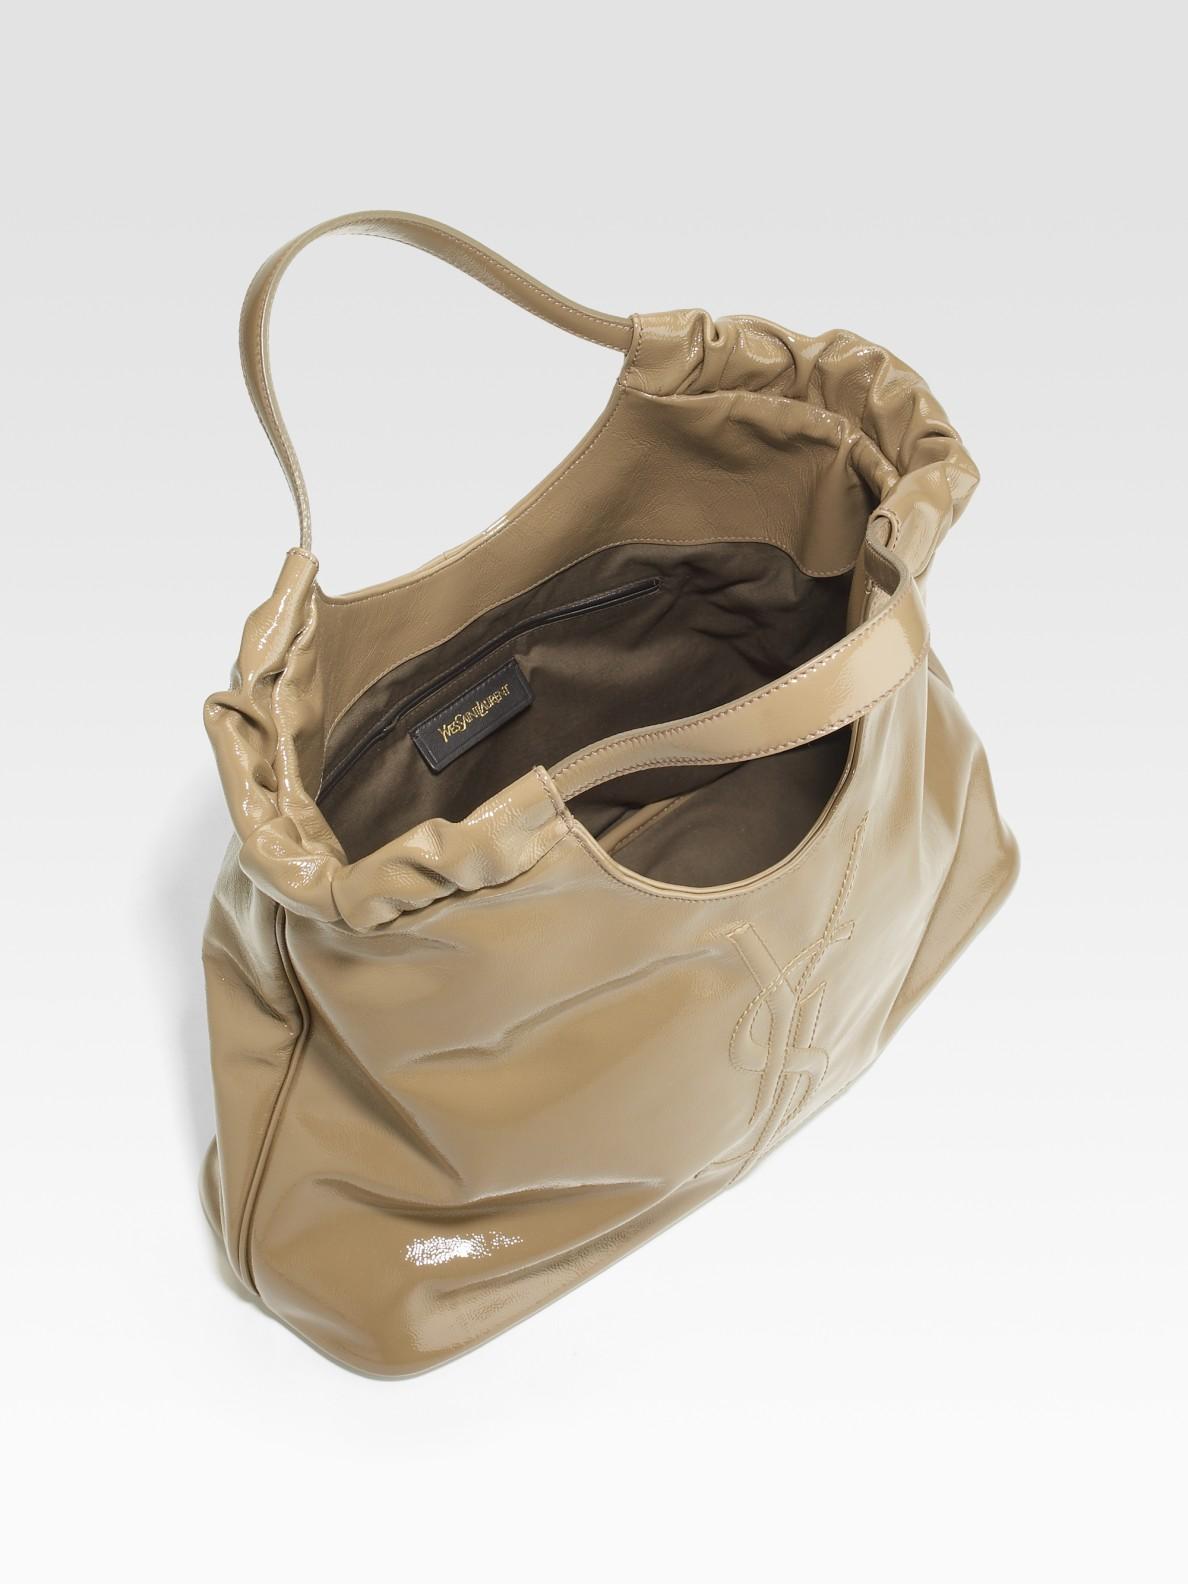 79fe5ebee6 Lyst - Saint Laurent Ysl Belle De Jour Medium Patent Leather Shopping Bag  in Brown